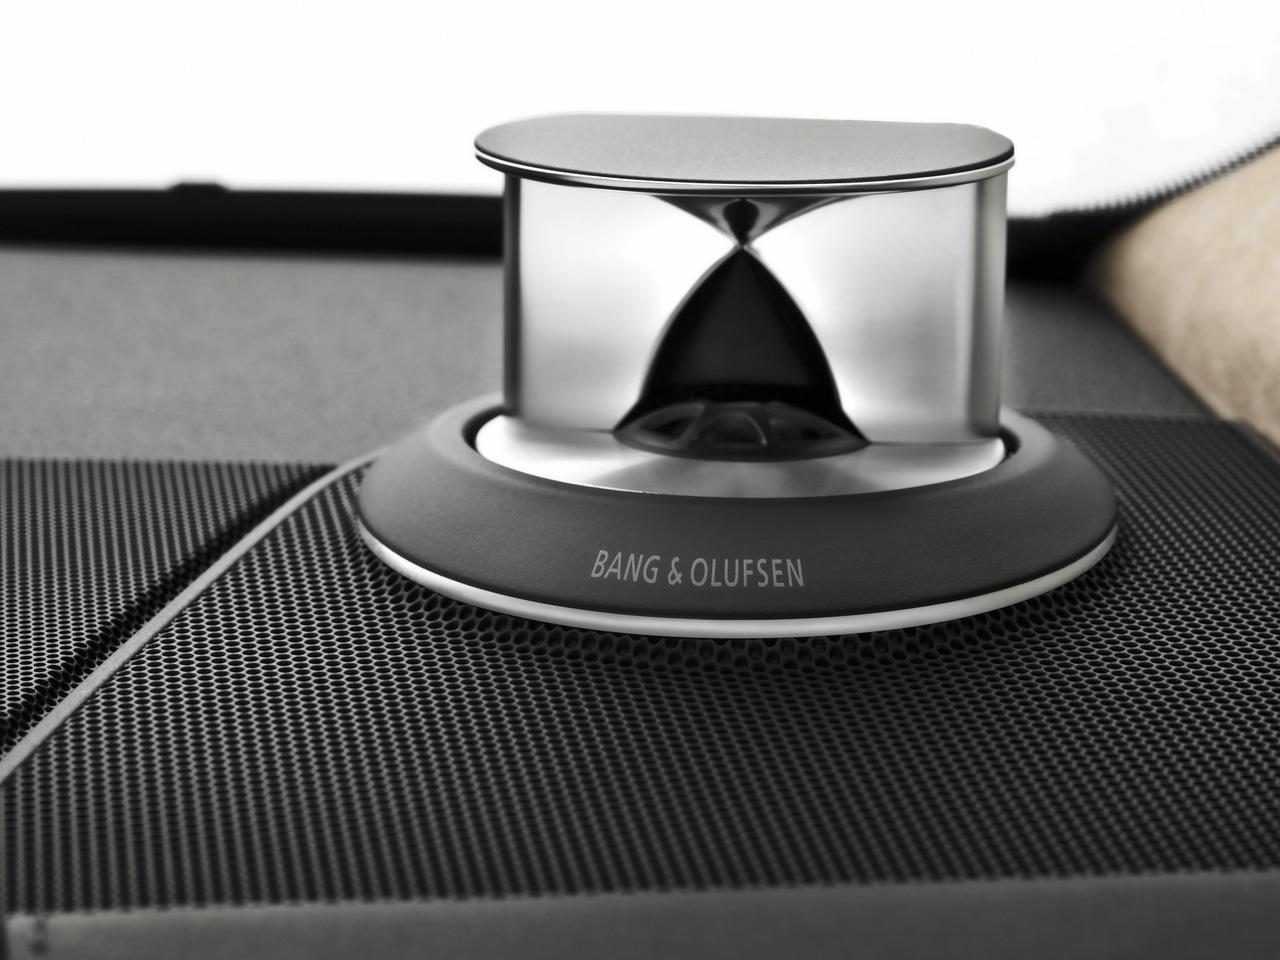 2009-Audi-Q7-Bang-Olufsen-3-1280x960.jpg 1,280×960 pixels